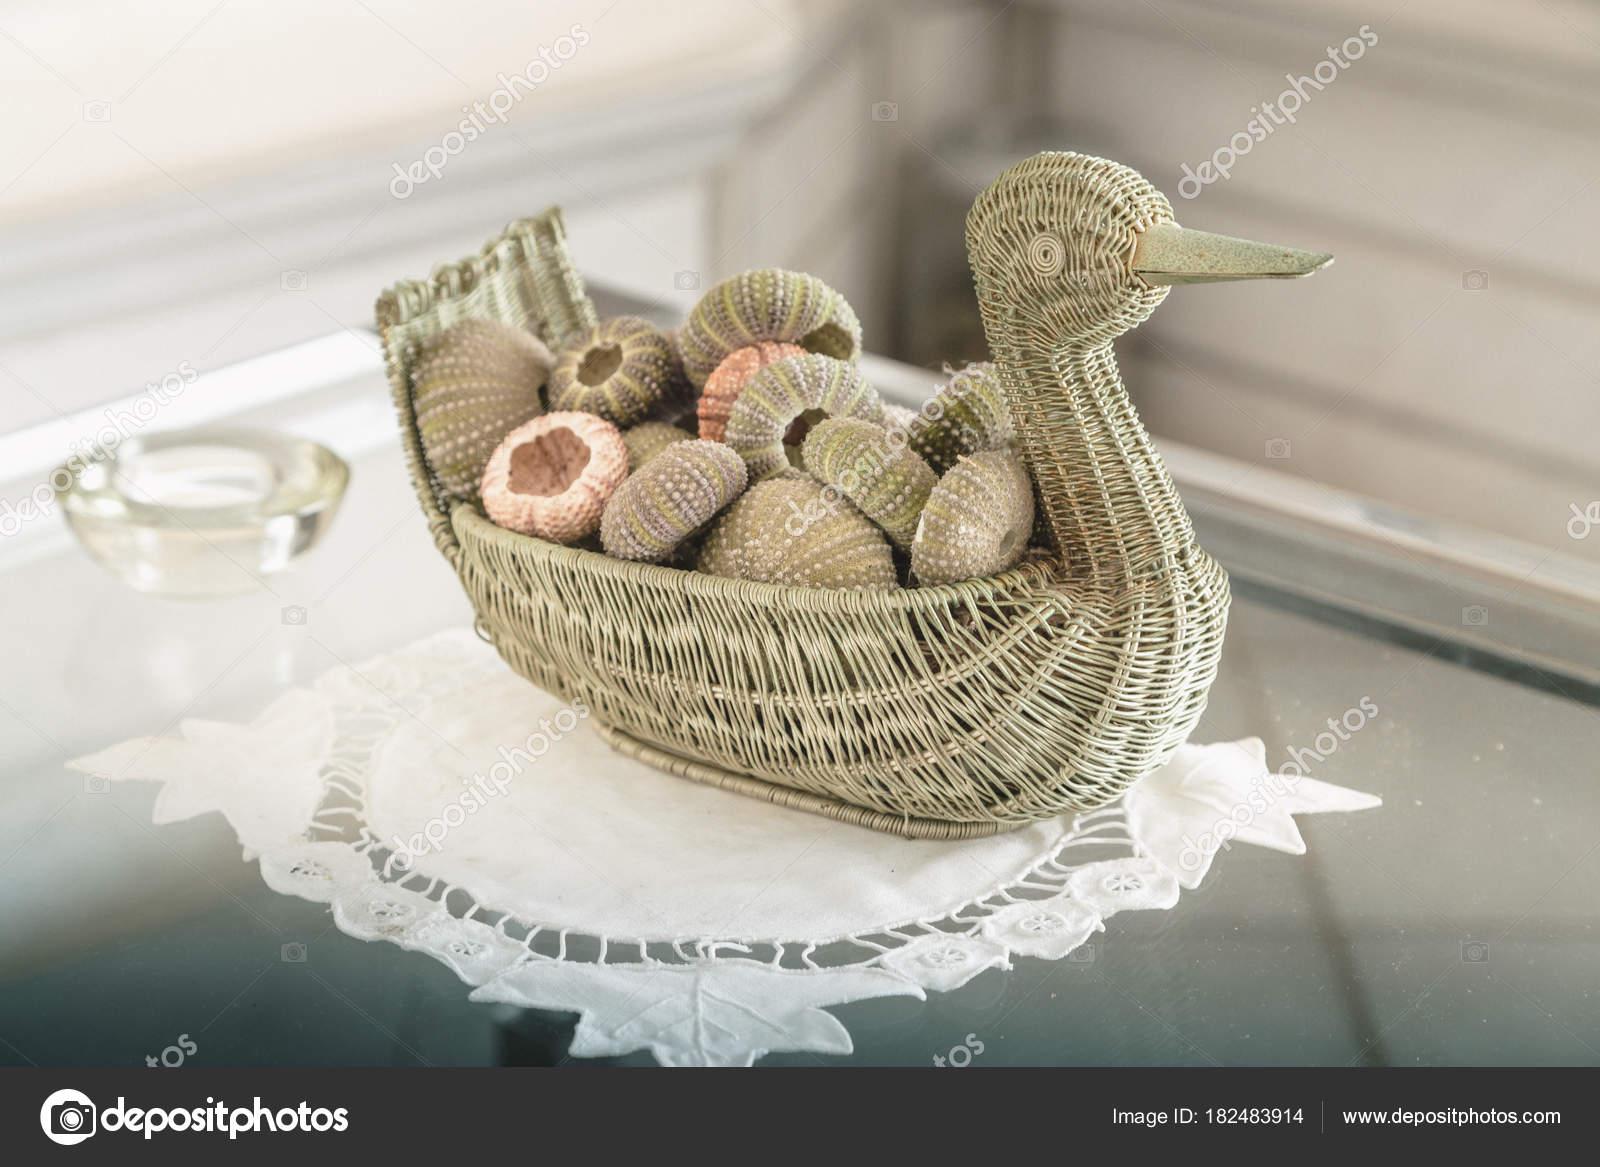 Home Decor Close Up Of Ornamental Decorative Balls In A Woven Stock Photo